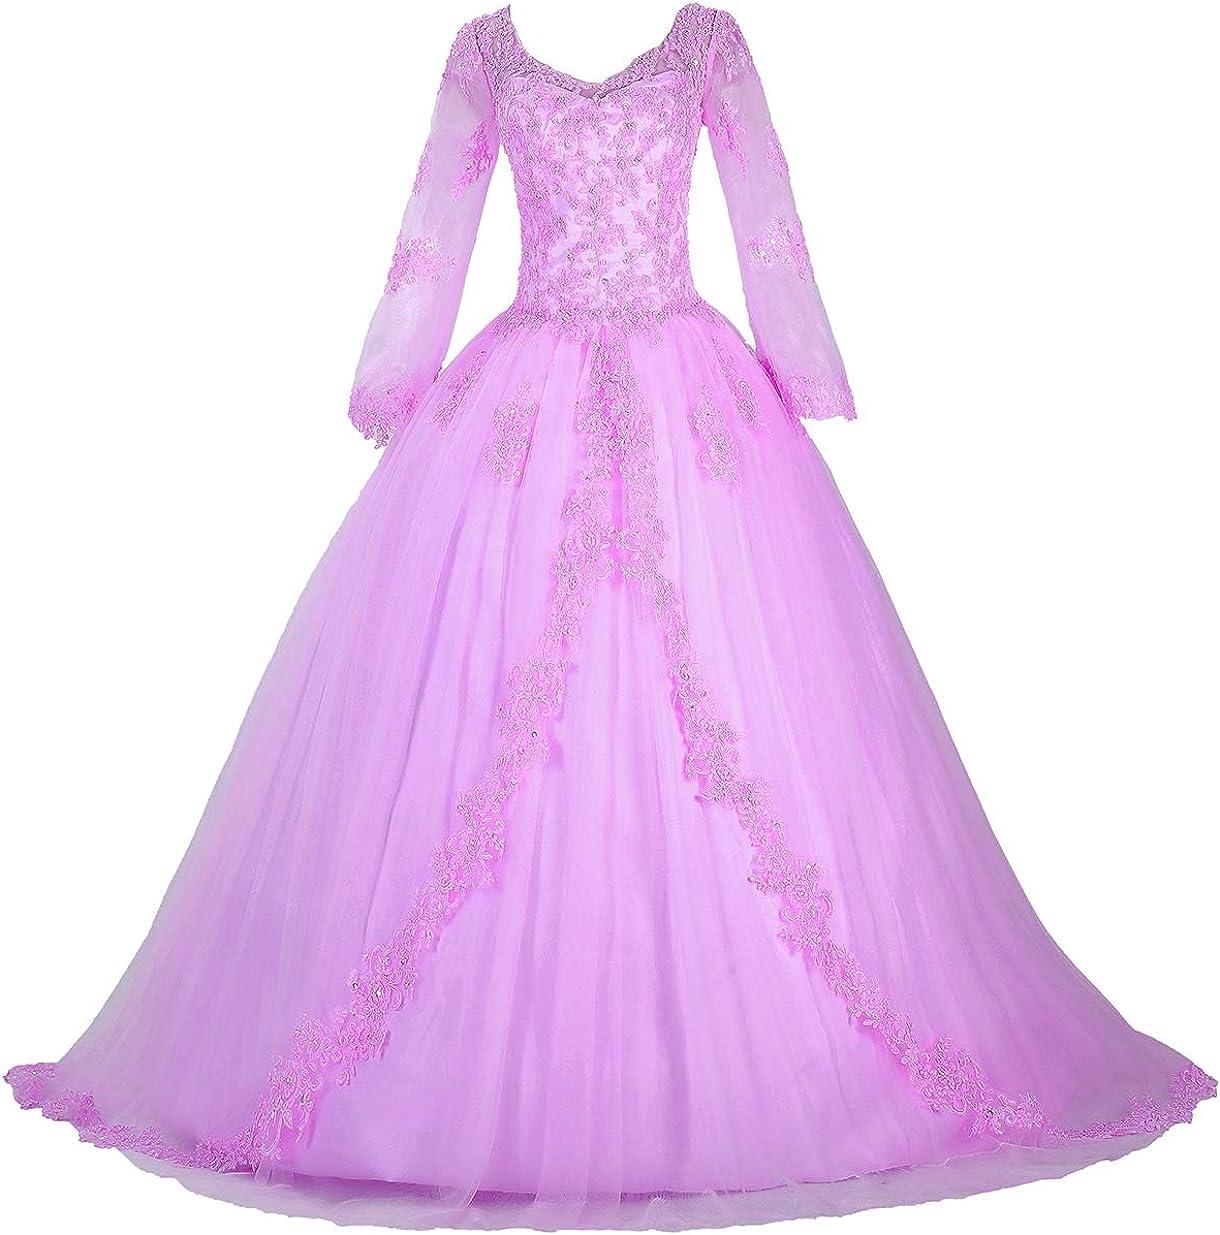 Eldecey Women's Women's V-Neck Lace Applique Sweet 16 Ball Gown Prom Quinceanera Dress